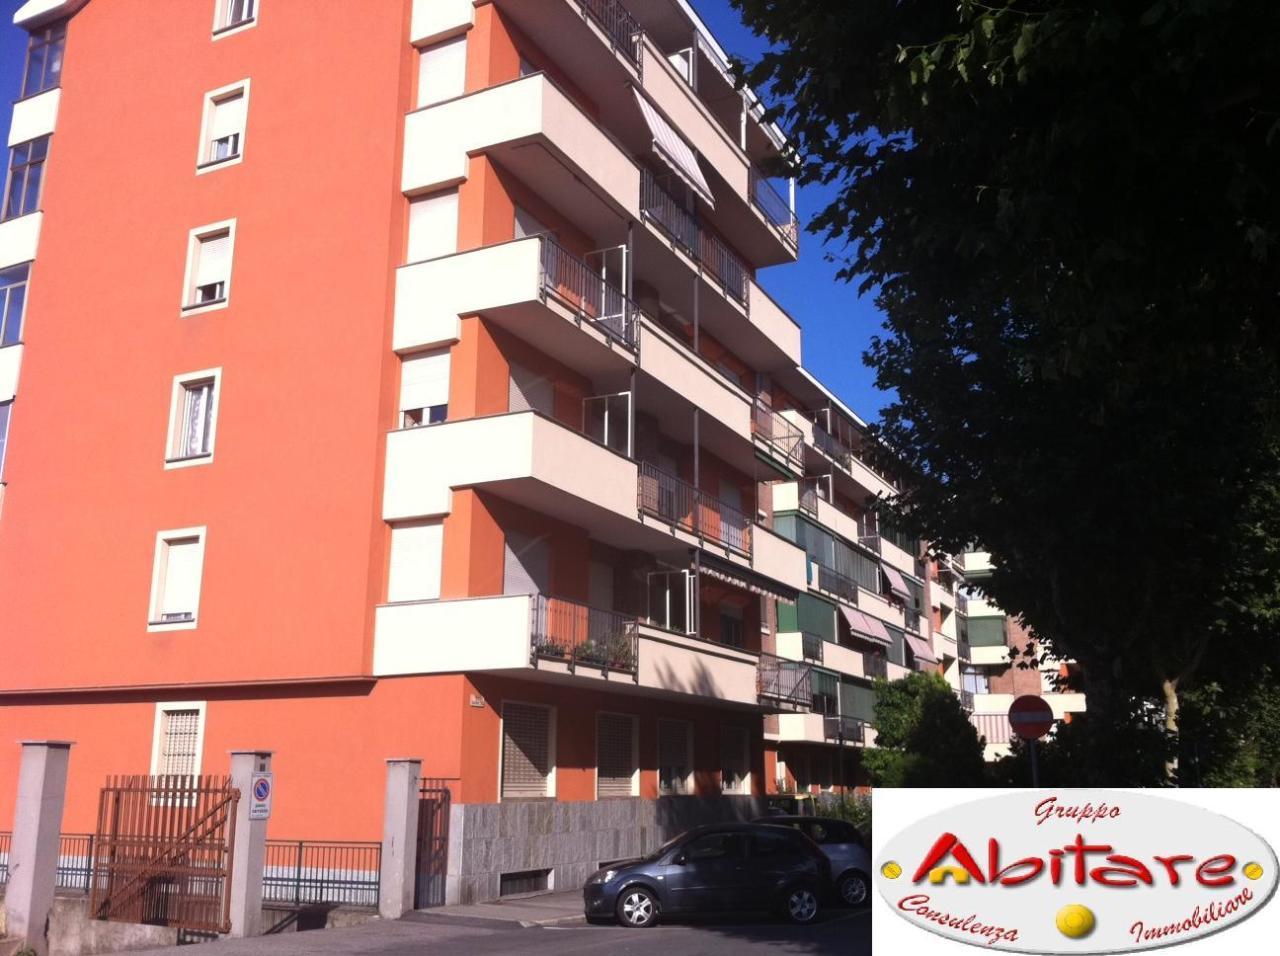 Locale commerciale - 2 Vetrine a Beinasco Rif. 12101176